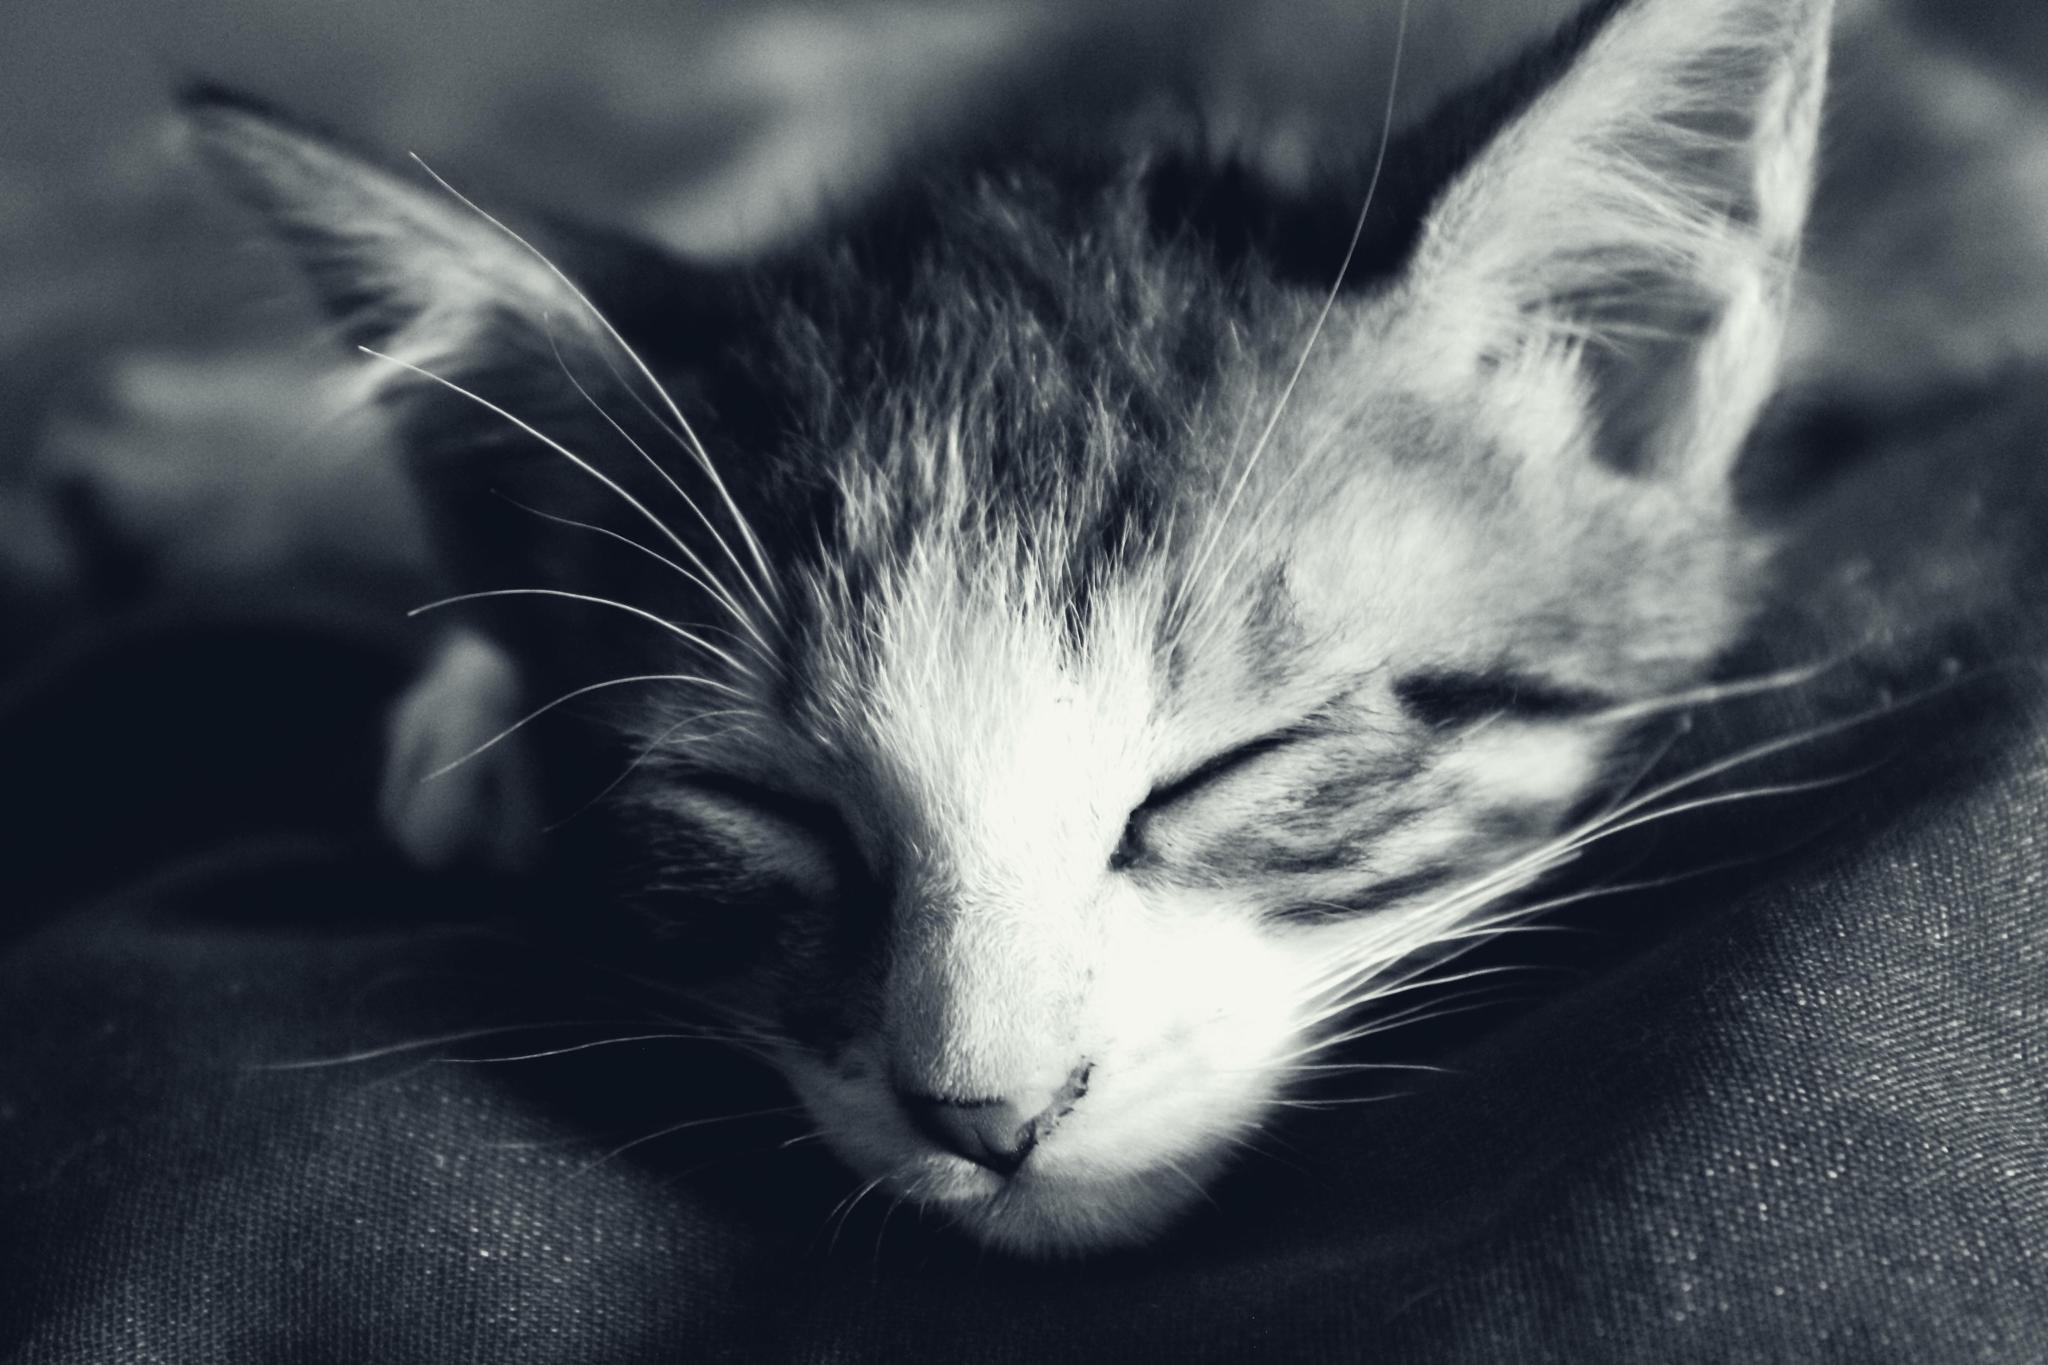 Sleeping Kitten by Kevin Mansilla